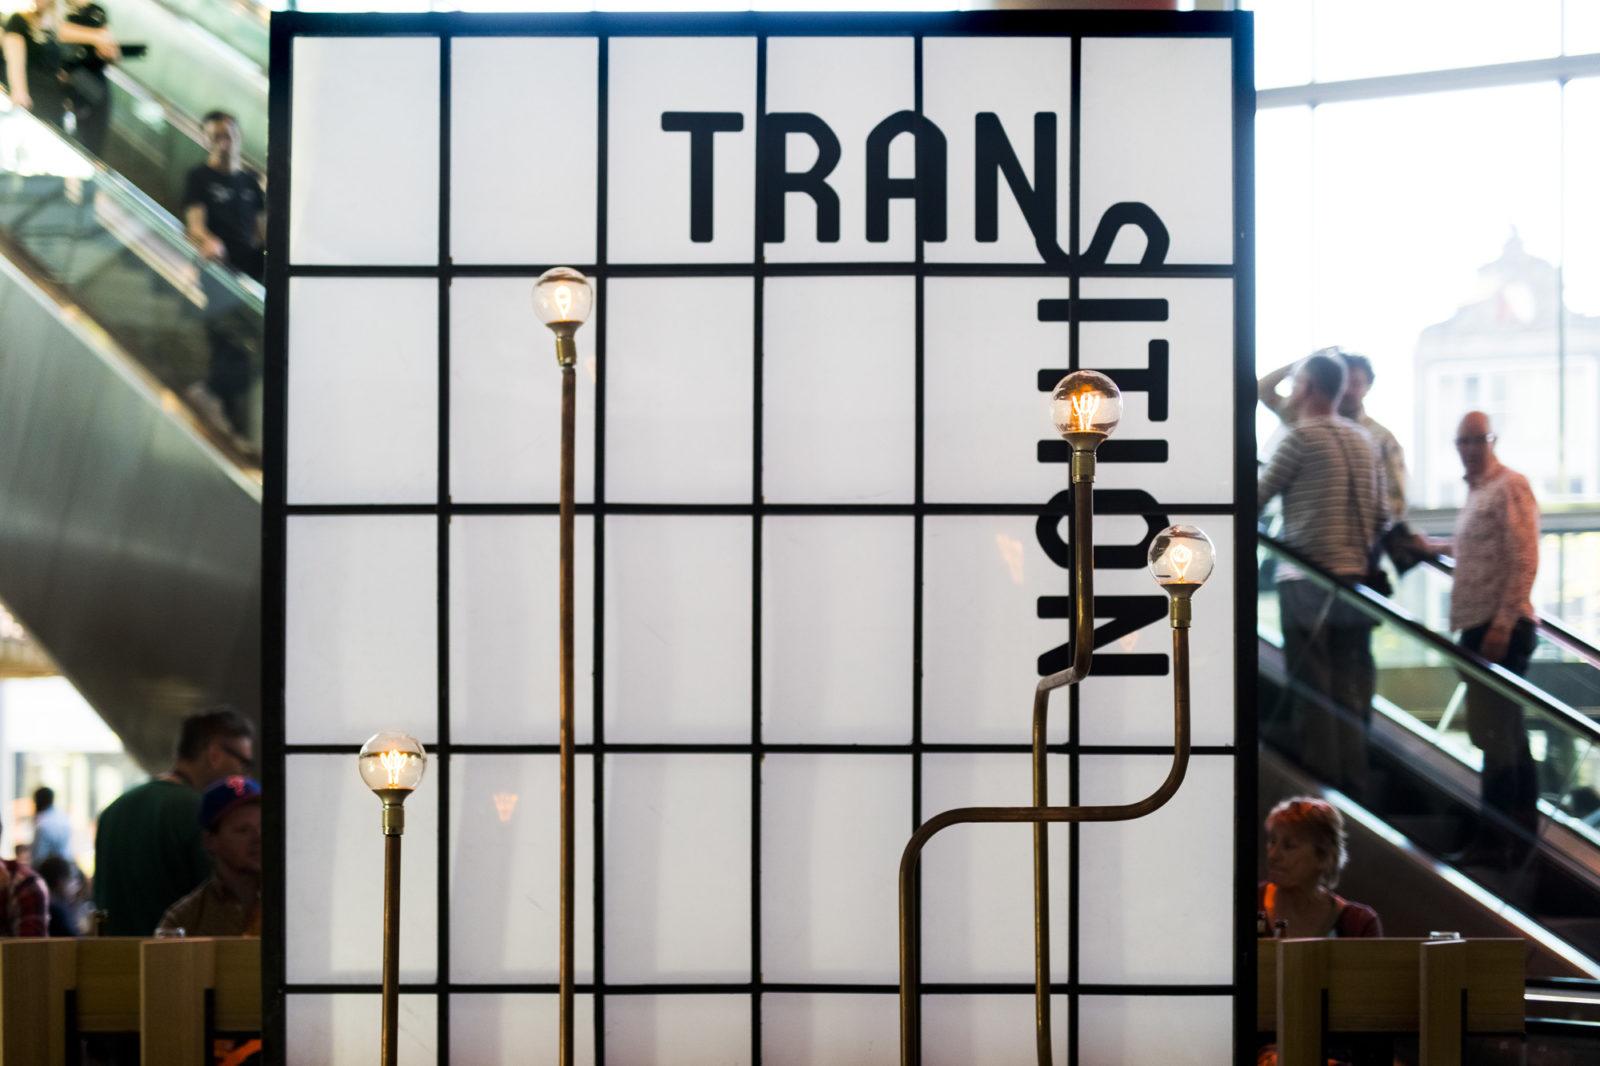 Triomf - transition tivolivredenburg festival triomf